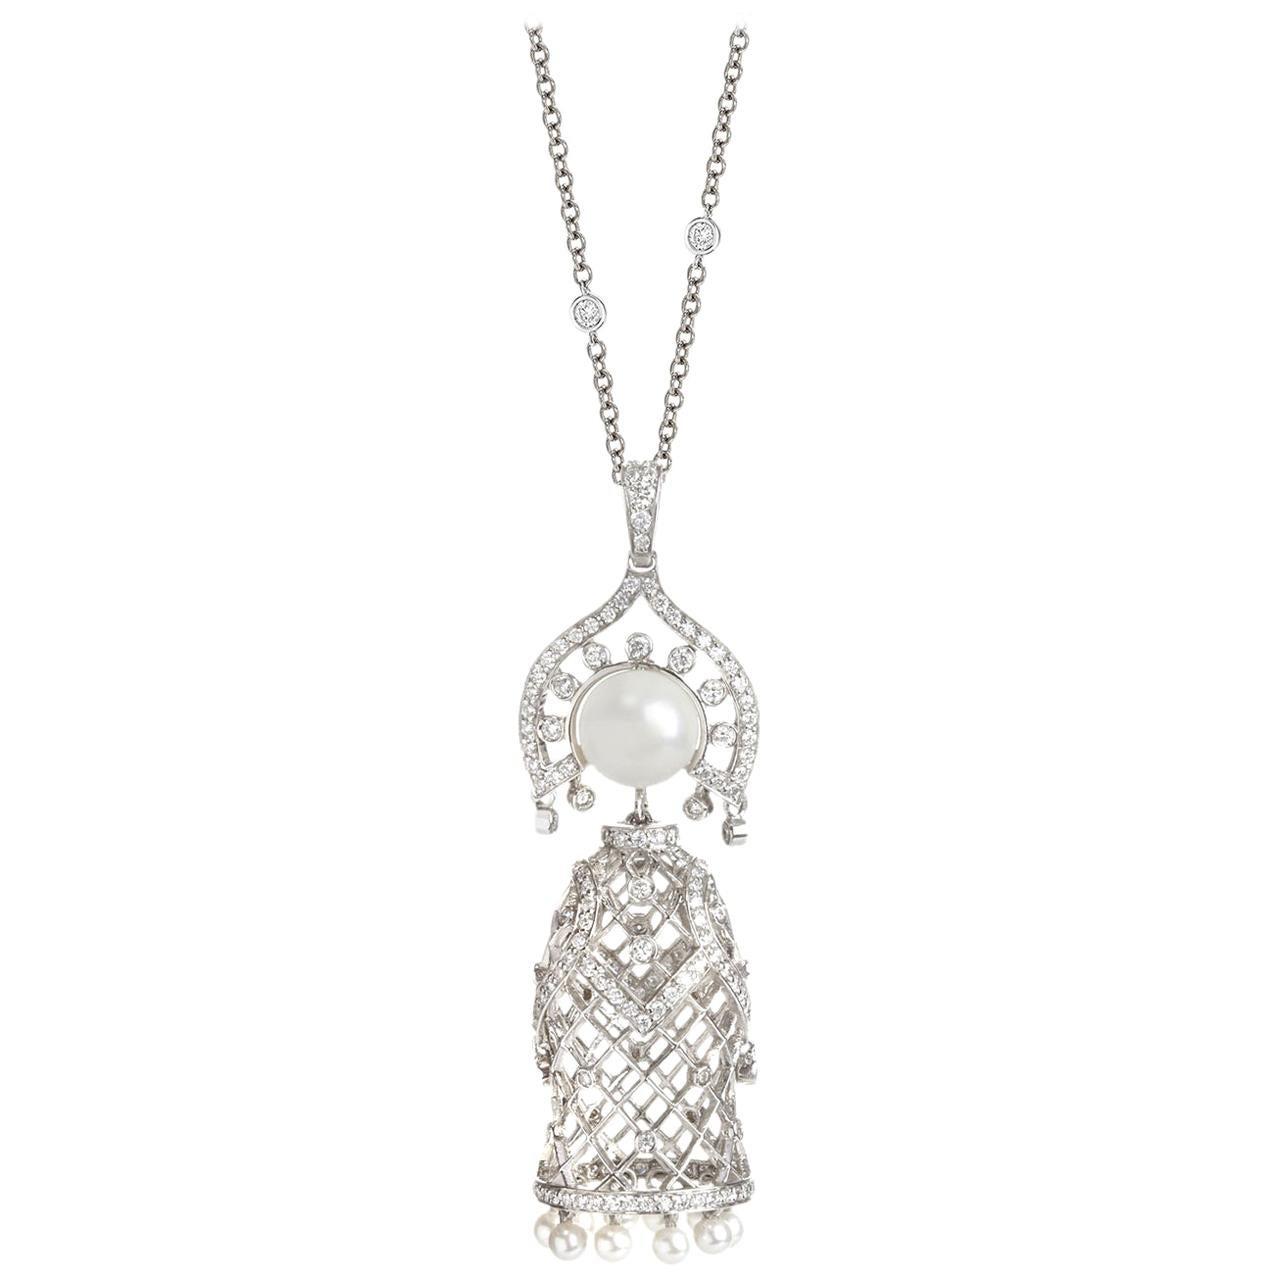 Sybarite Jewellery Doll Pendant Necklace 18 Karat White Gold 1.28 Carat Diamond